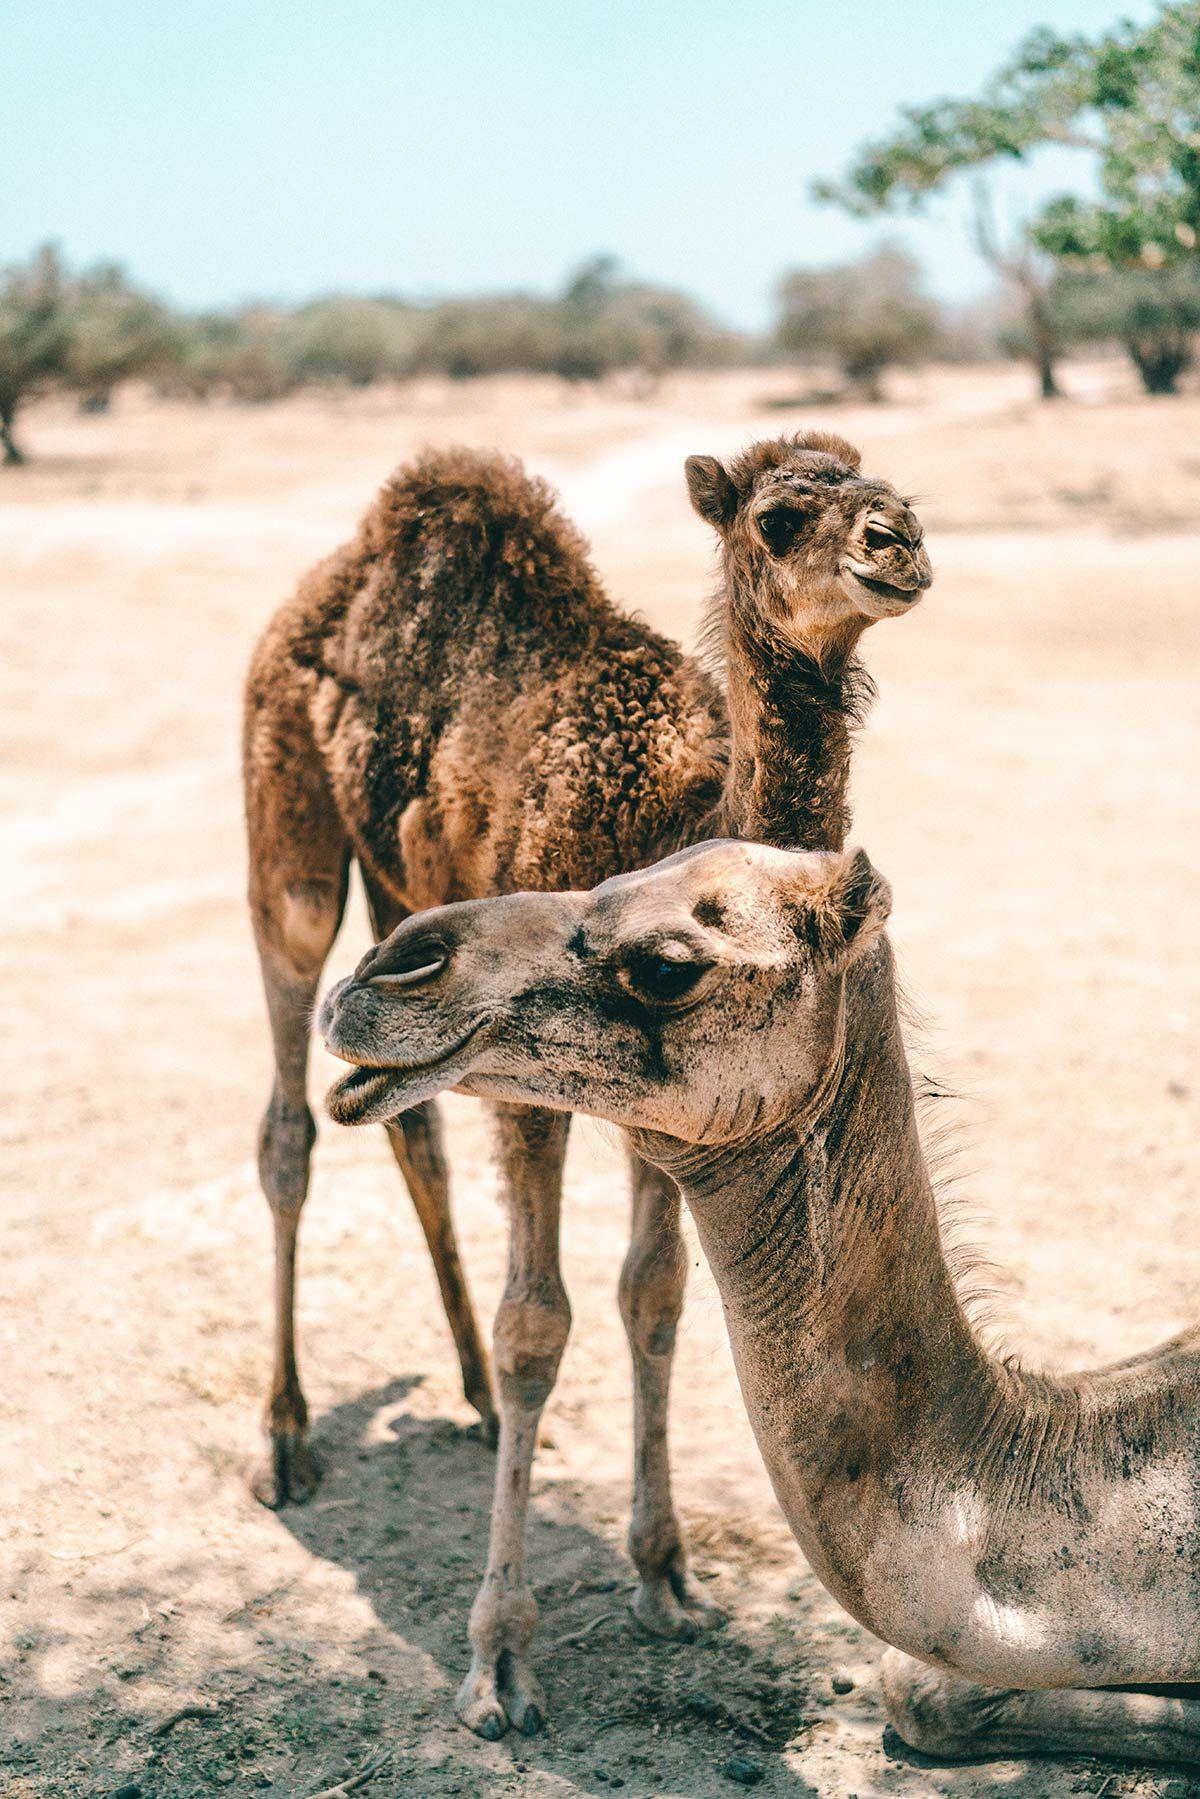 Oman Urlaub 7 Grunde Nach Salalah Im Oman Zu Reisen Oman Urlaub Salalah Oman